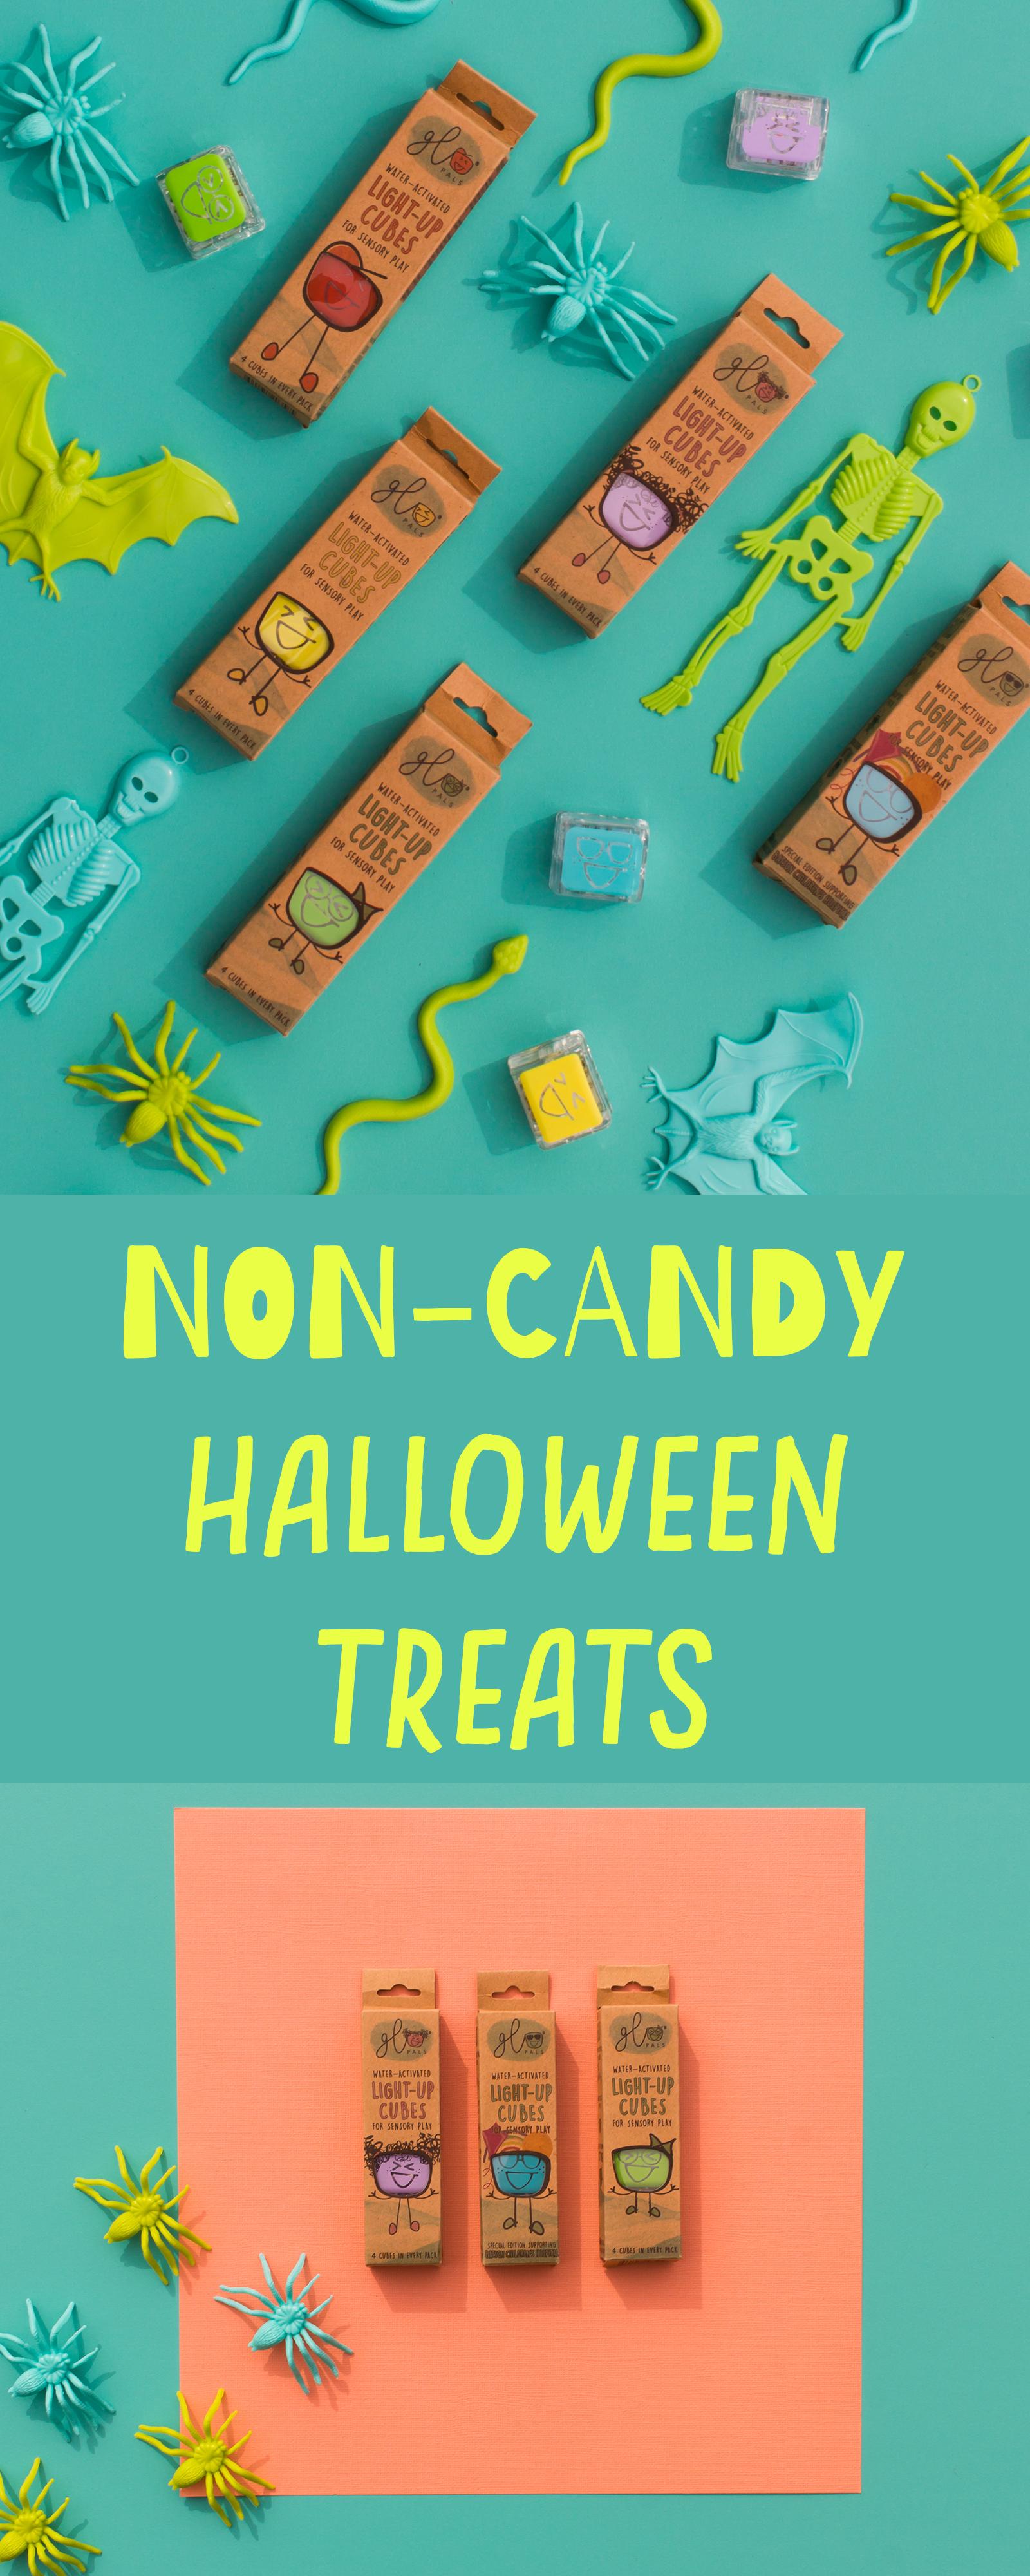 non-candy halloween treats.jpg